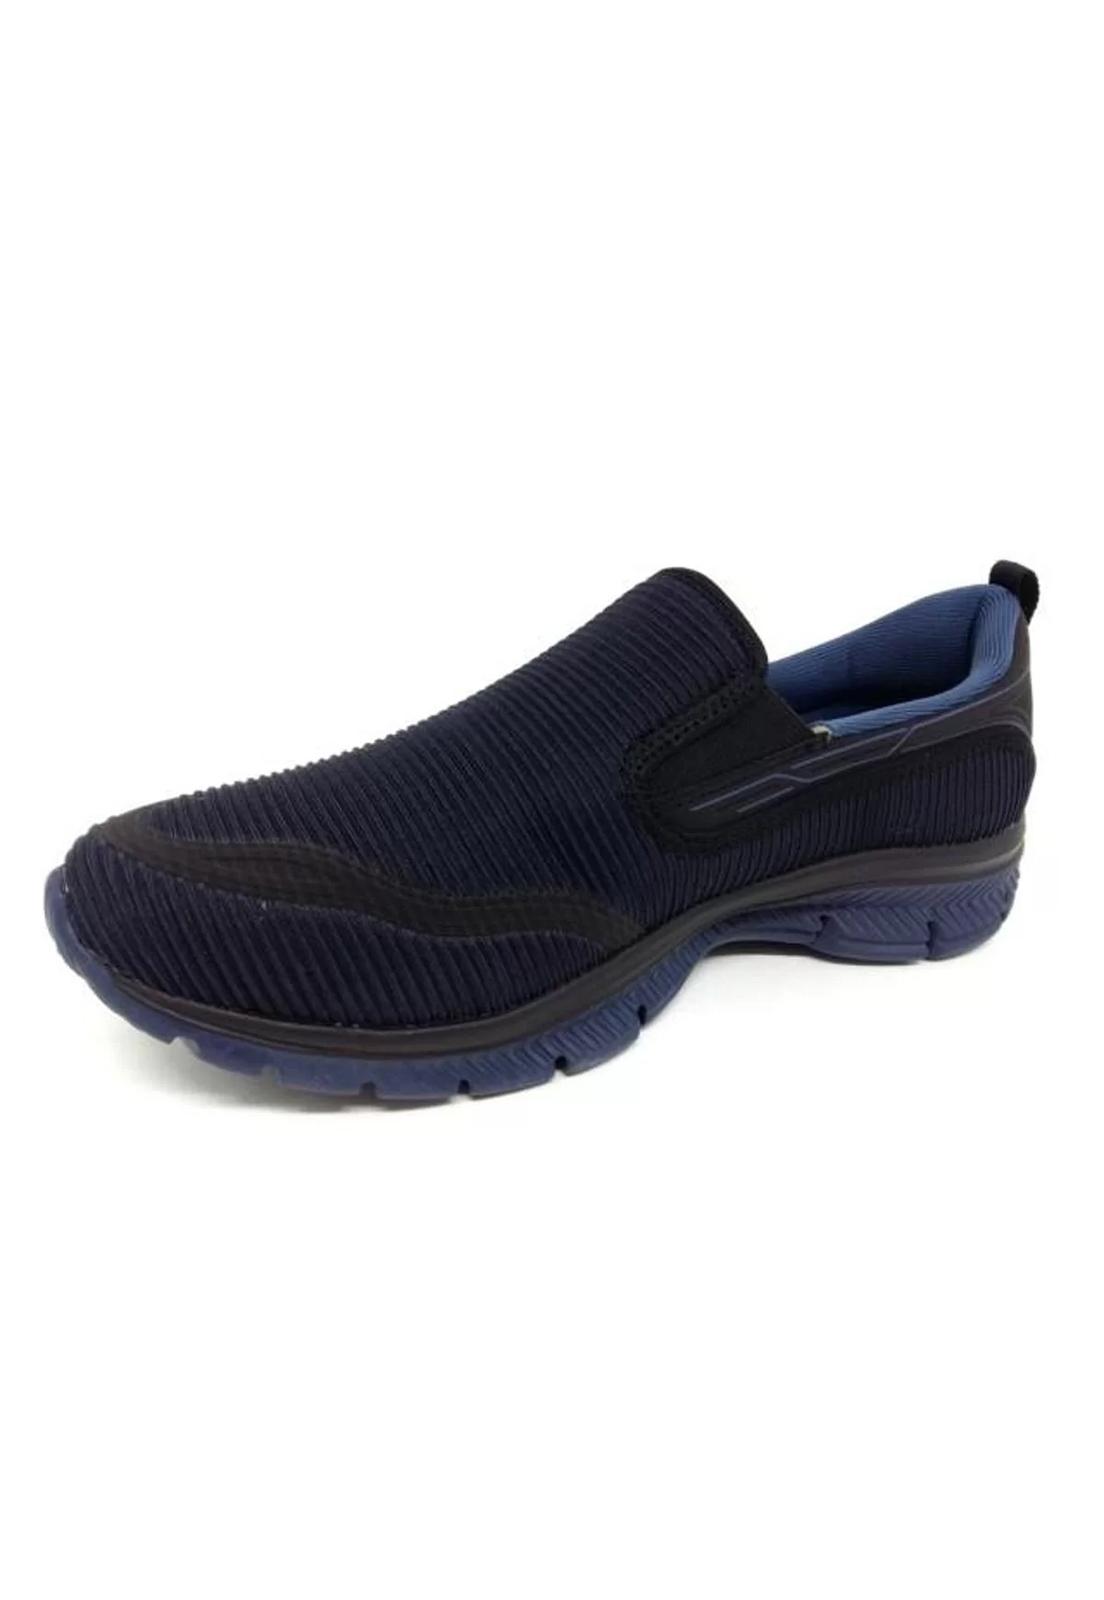 Tênis Olympikus Wellness 322 Masculino - Preto Azul